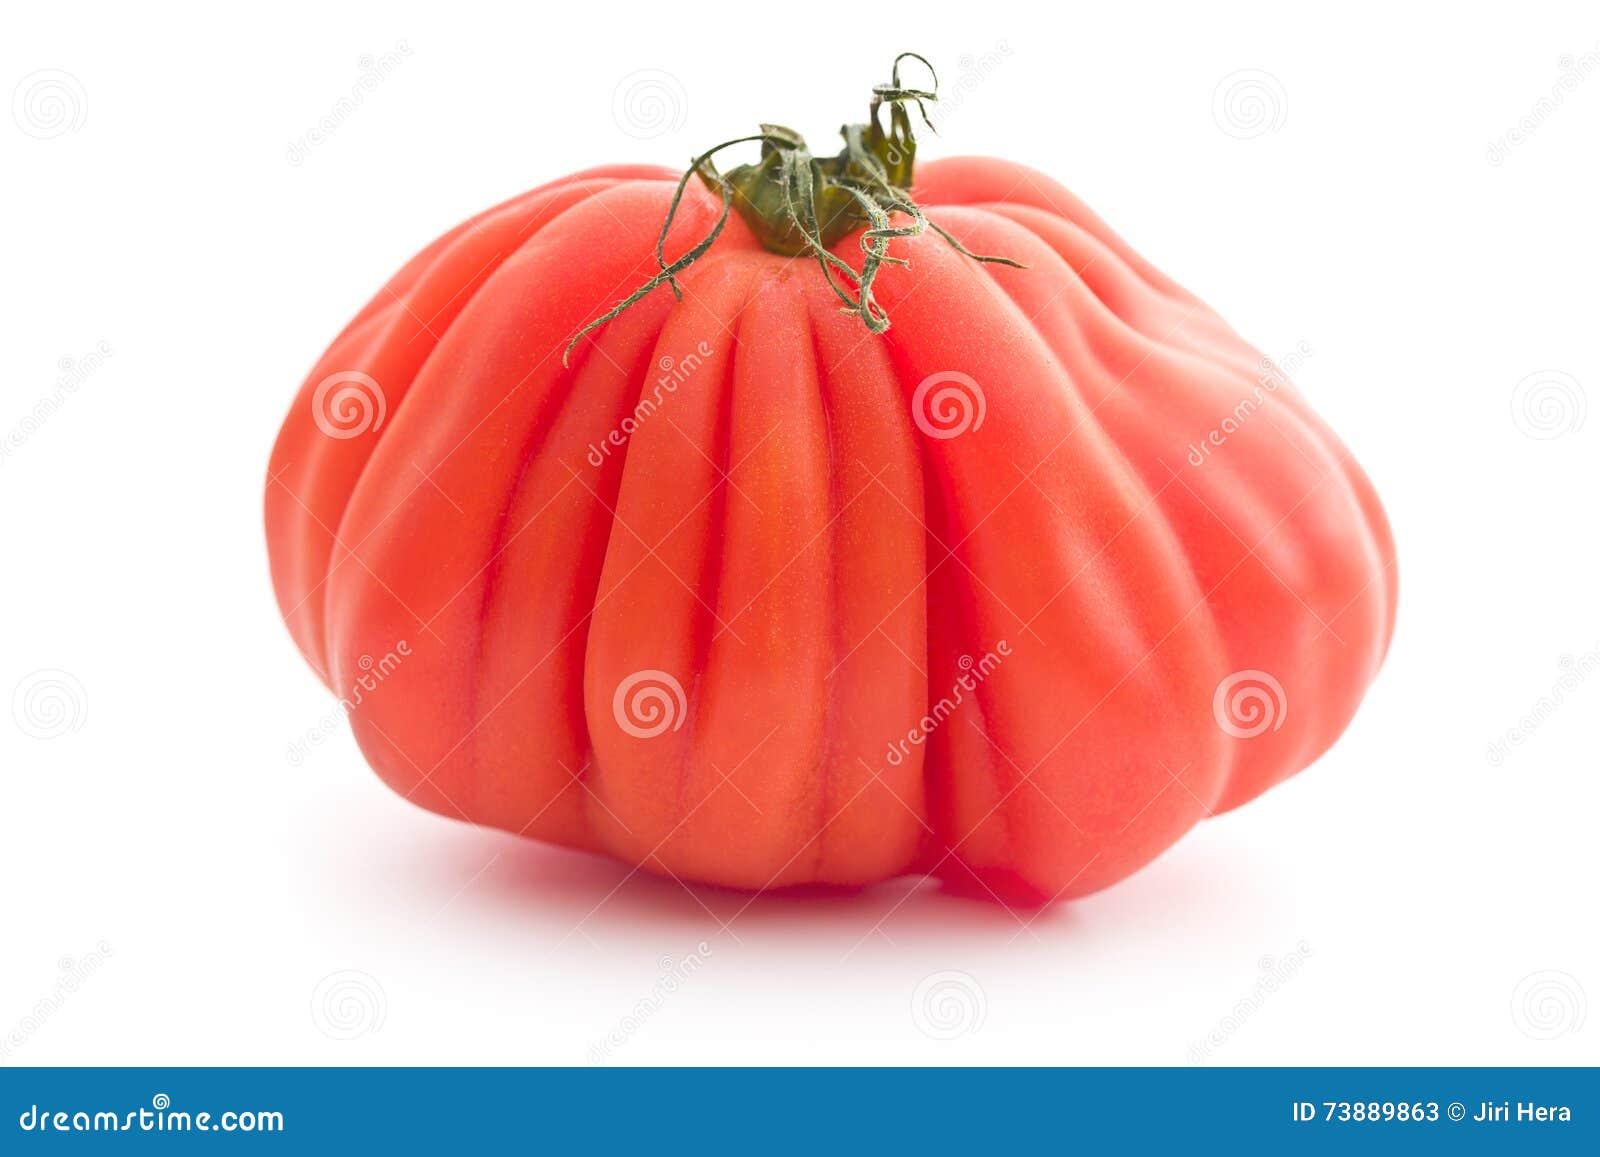 Download Beefsteak Tomatoes. Coeur De Boeuf. Stock Image - Image of harvest, fresh: 73889863